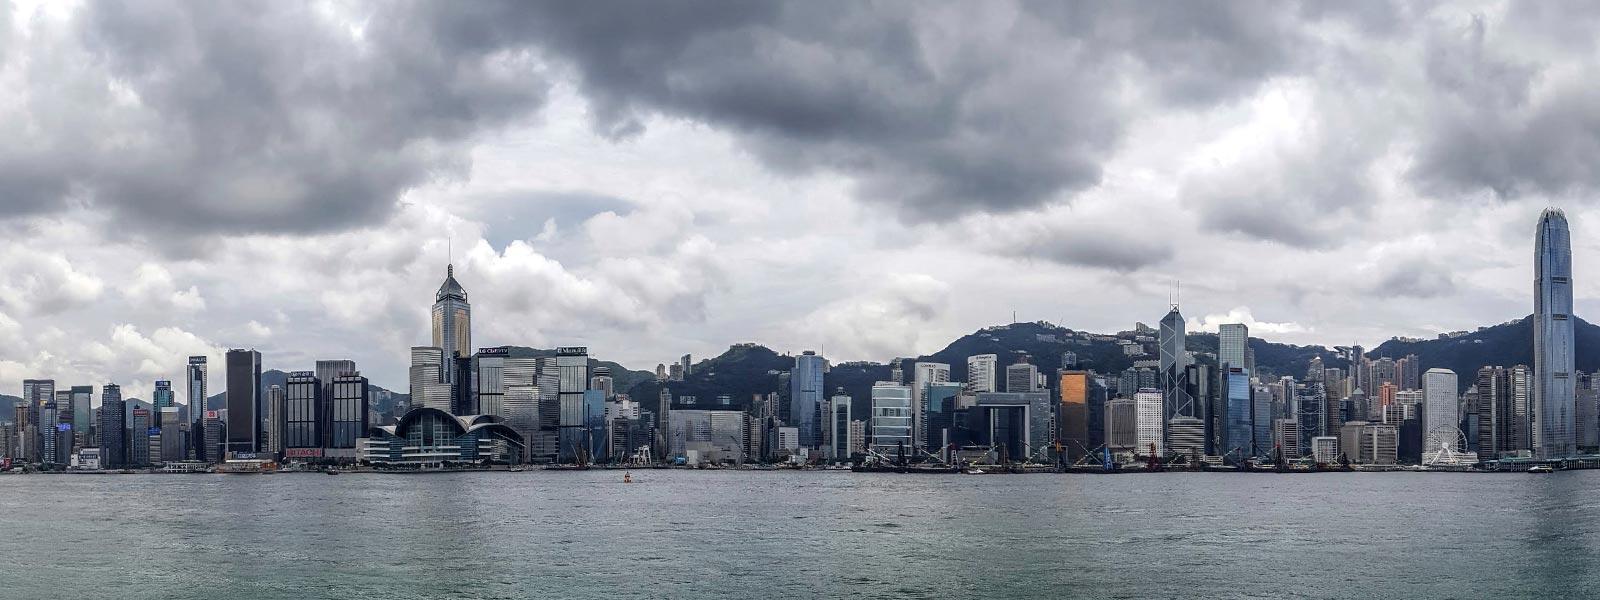 The City of Hong Kong Skyline